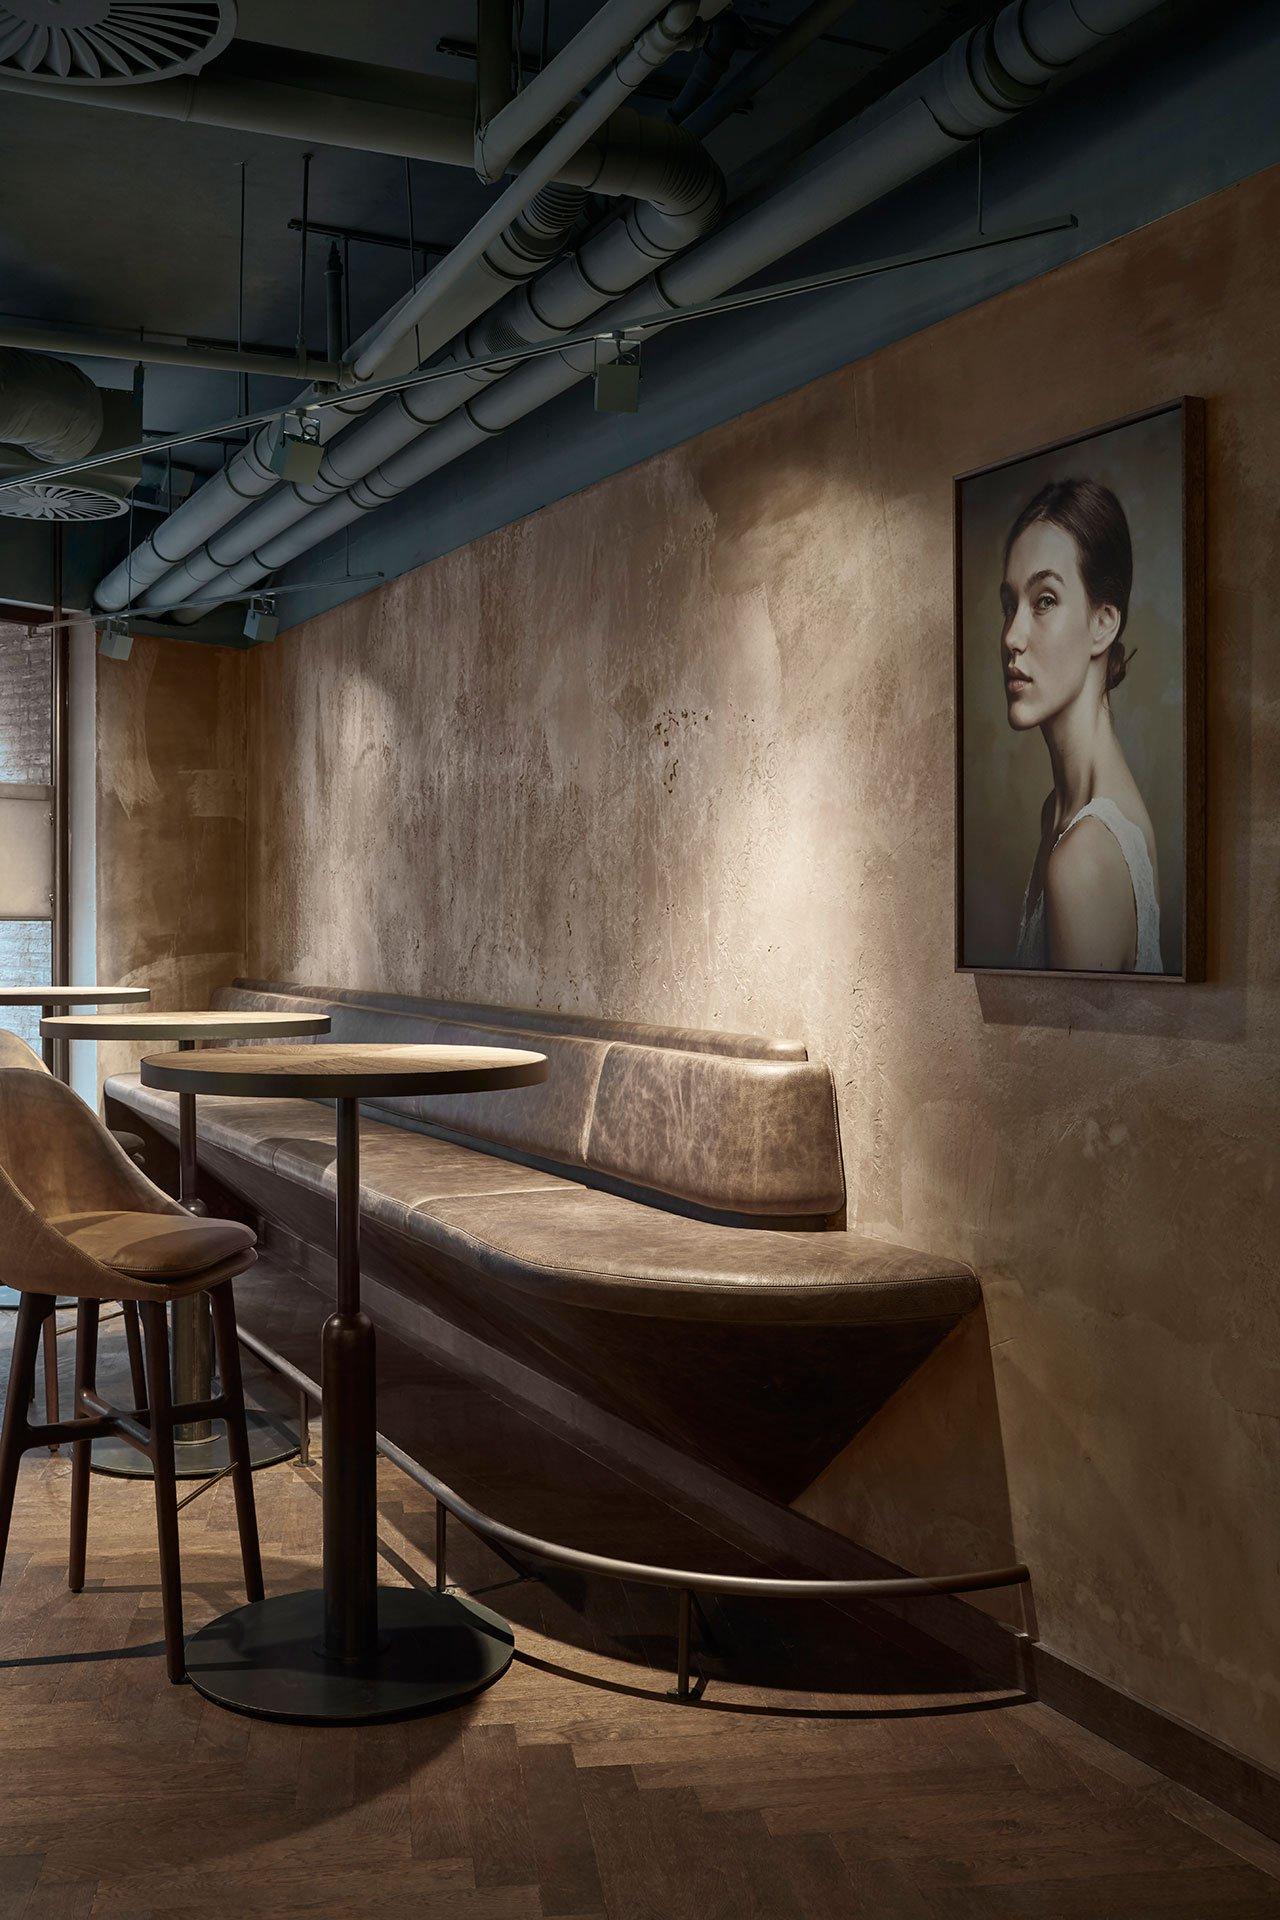 s3_restaurant_wyers_and_miss_louisa_amsterdam_the_netherlands_studio_modijefsky_yatzer-1.jpg